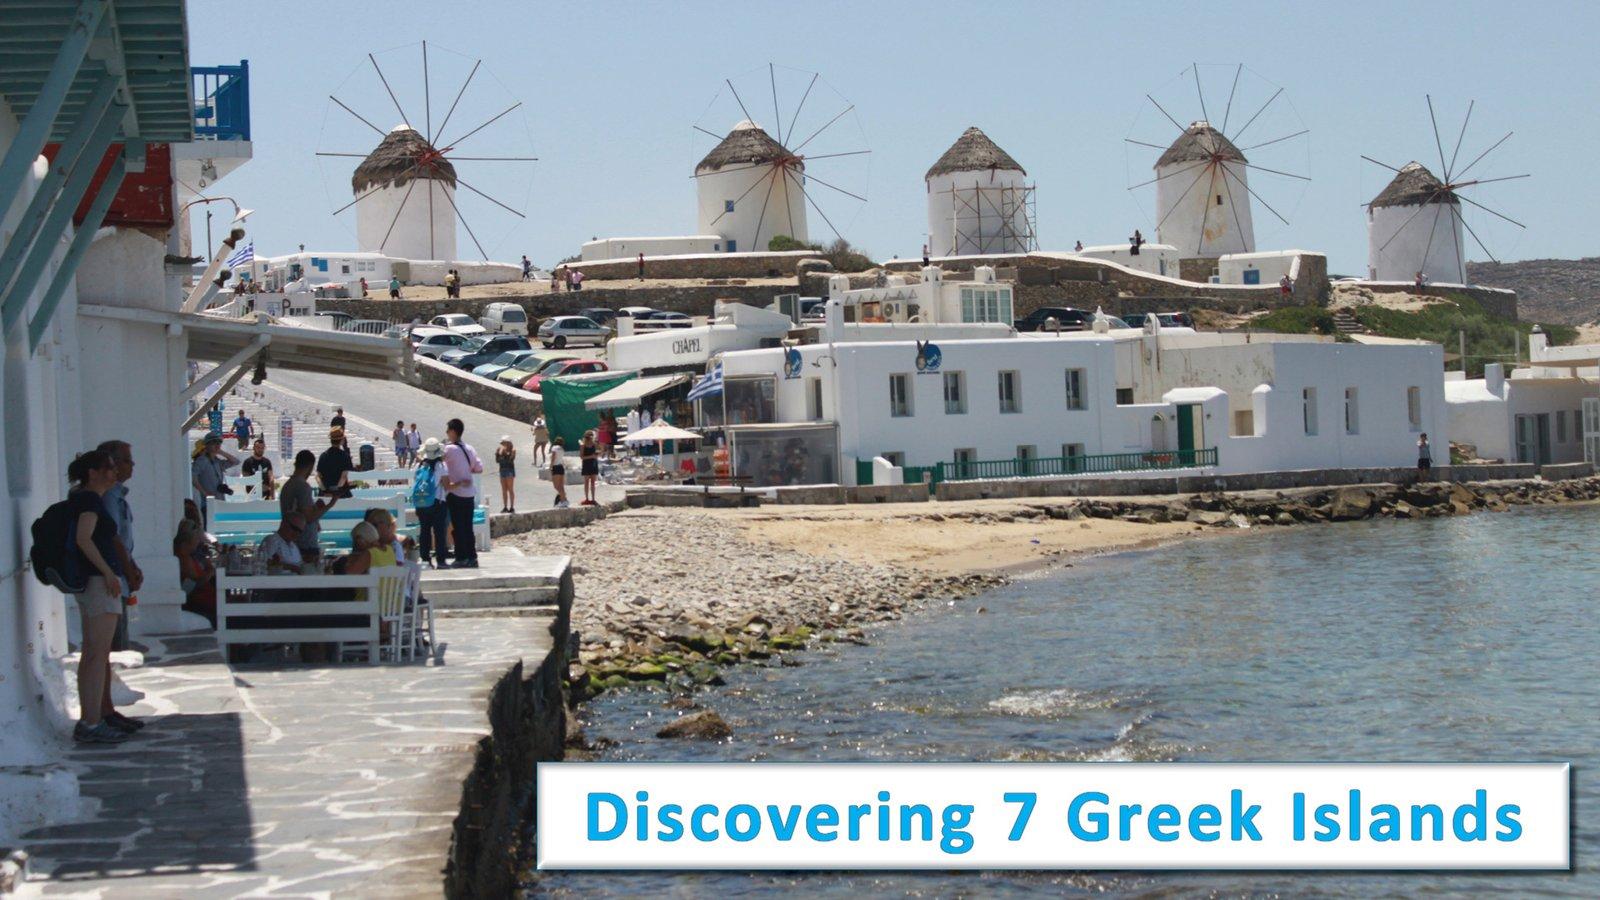 Discovering 7 Greek Islands